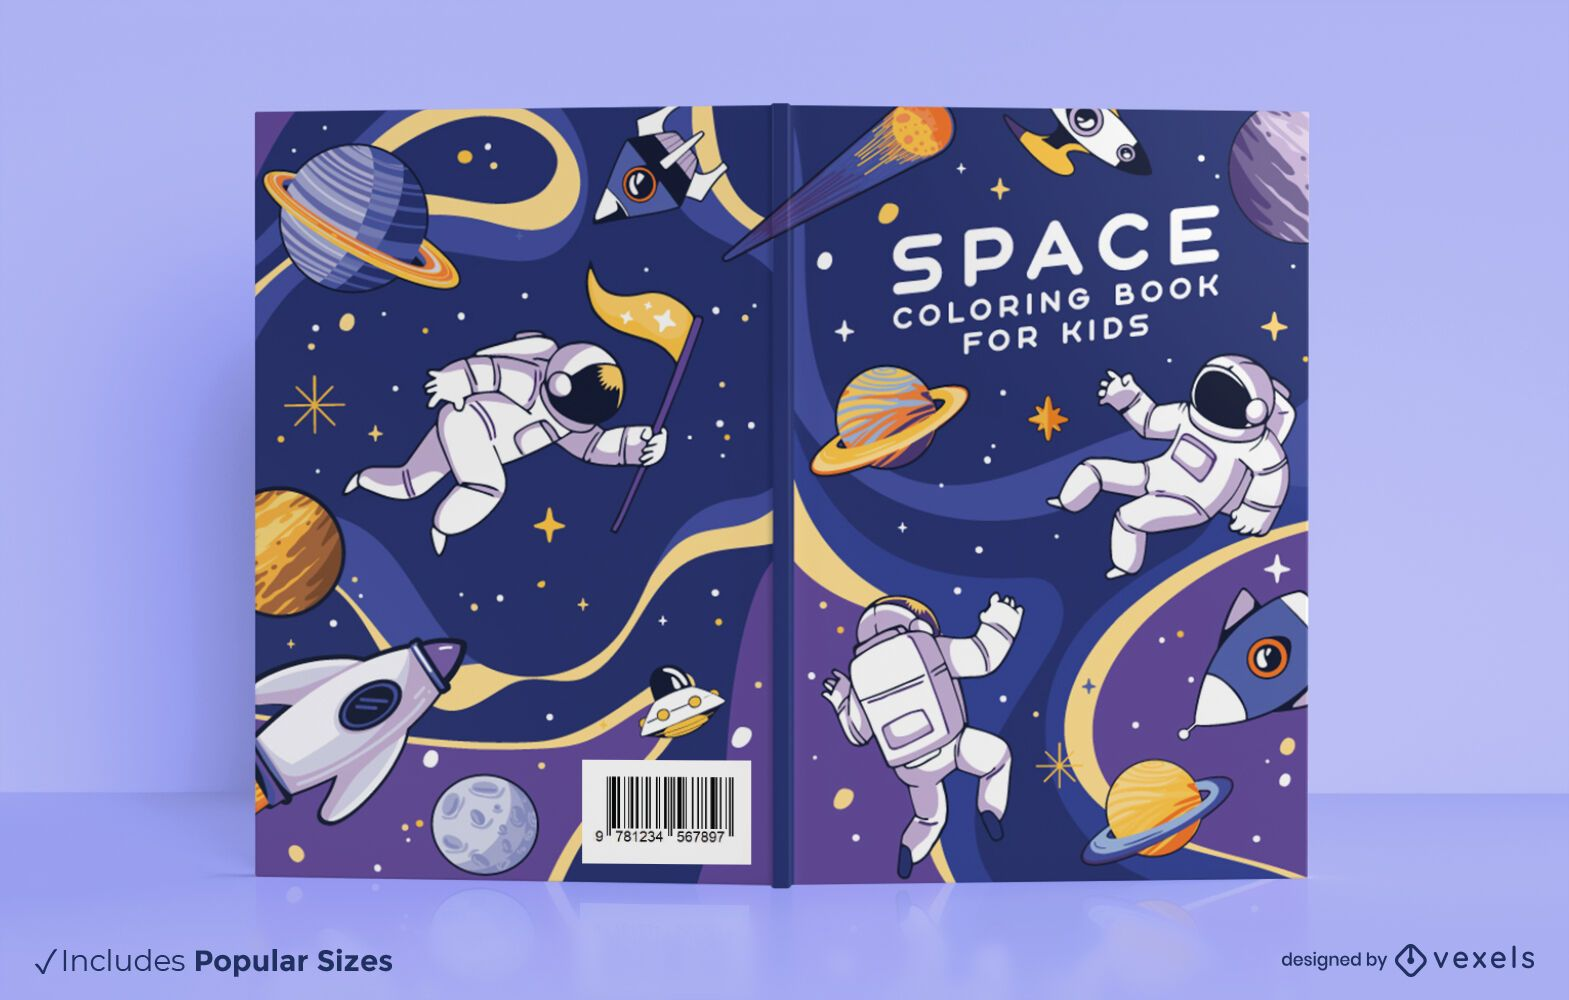 Diseño de portada de libro para colorear espacial